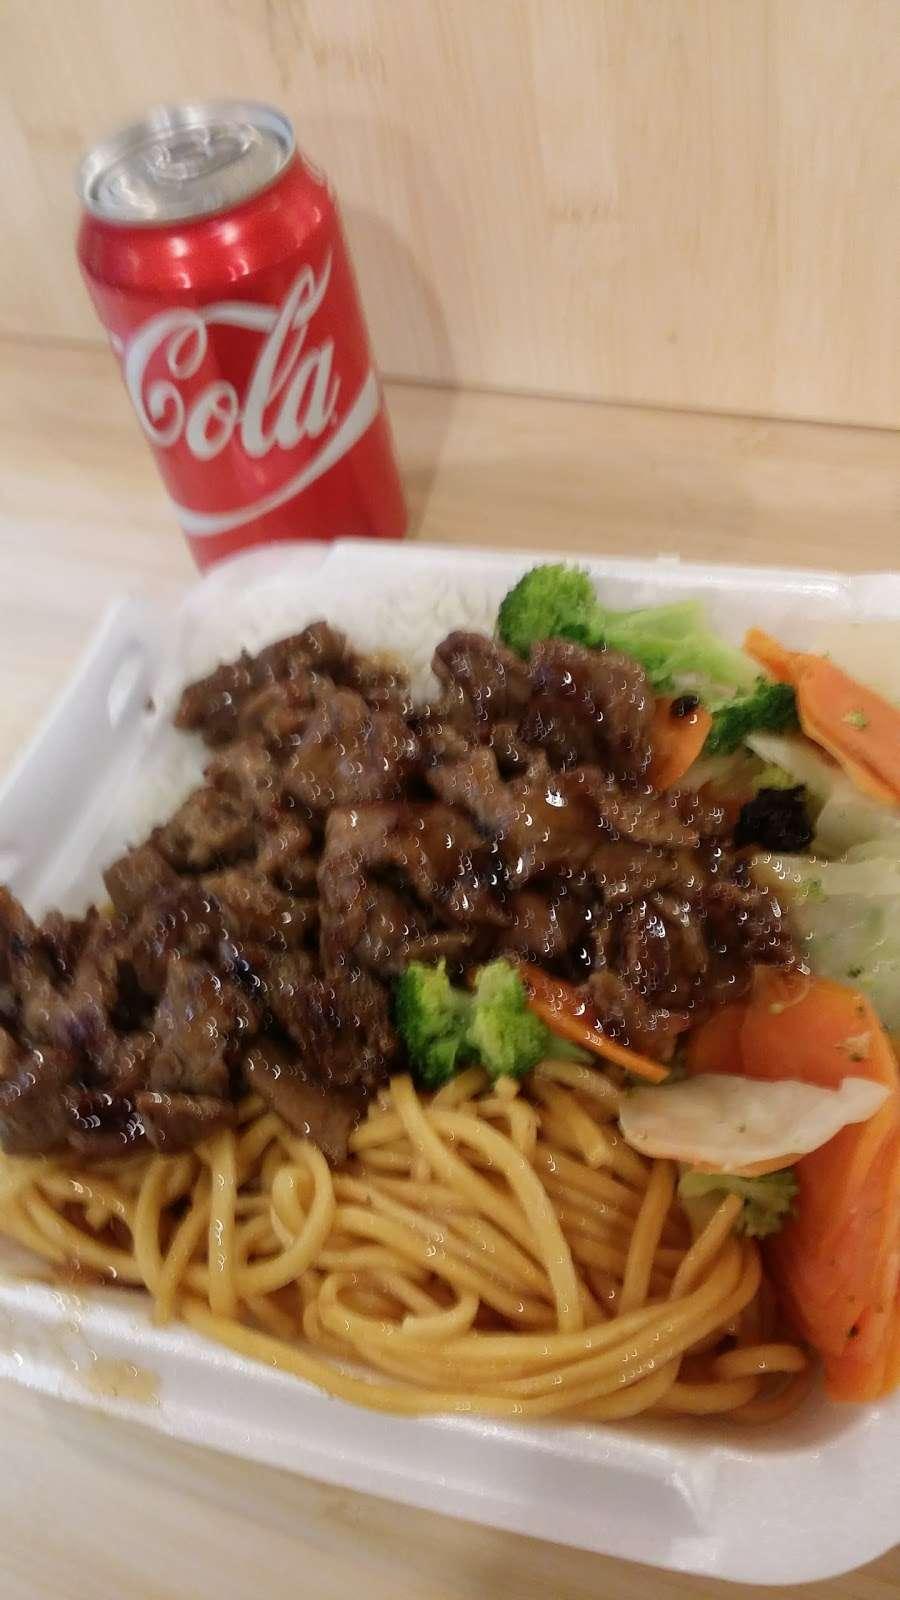 Pitopia - restaurant  | Photo 10 of 10 | Address: 43 E 34th St, New York, NY 10016, USA | Phone: (212) 792-6765